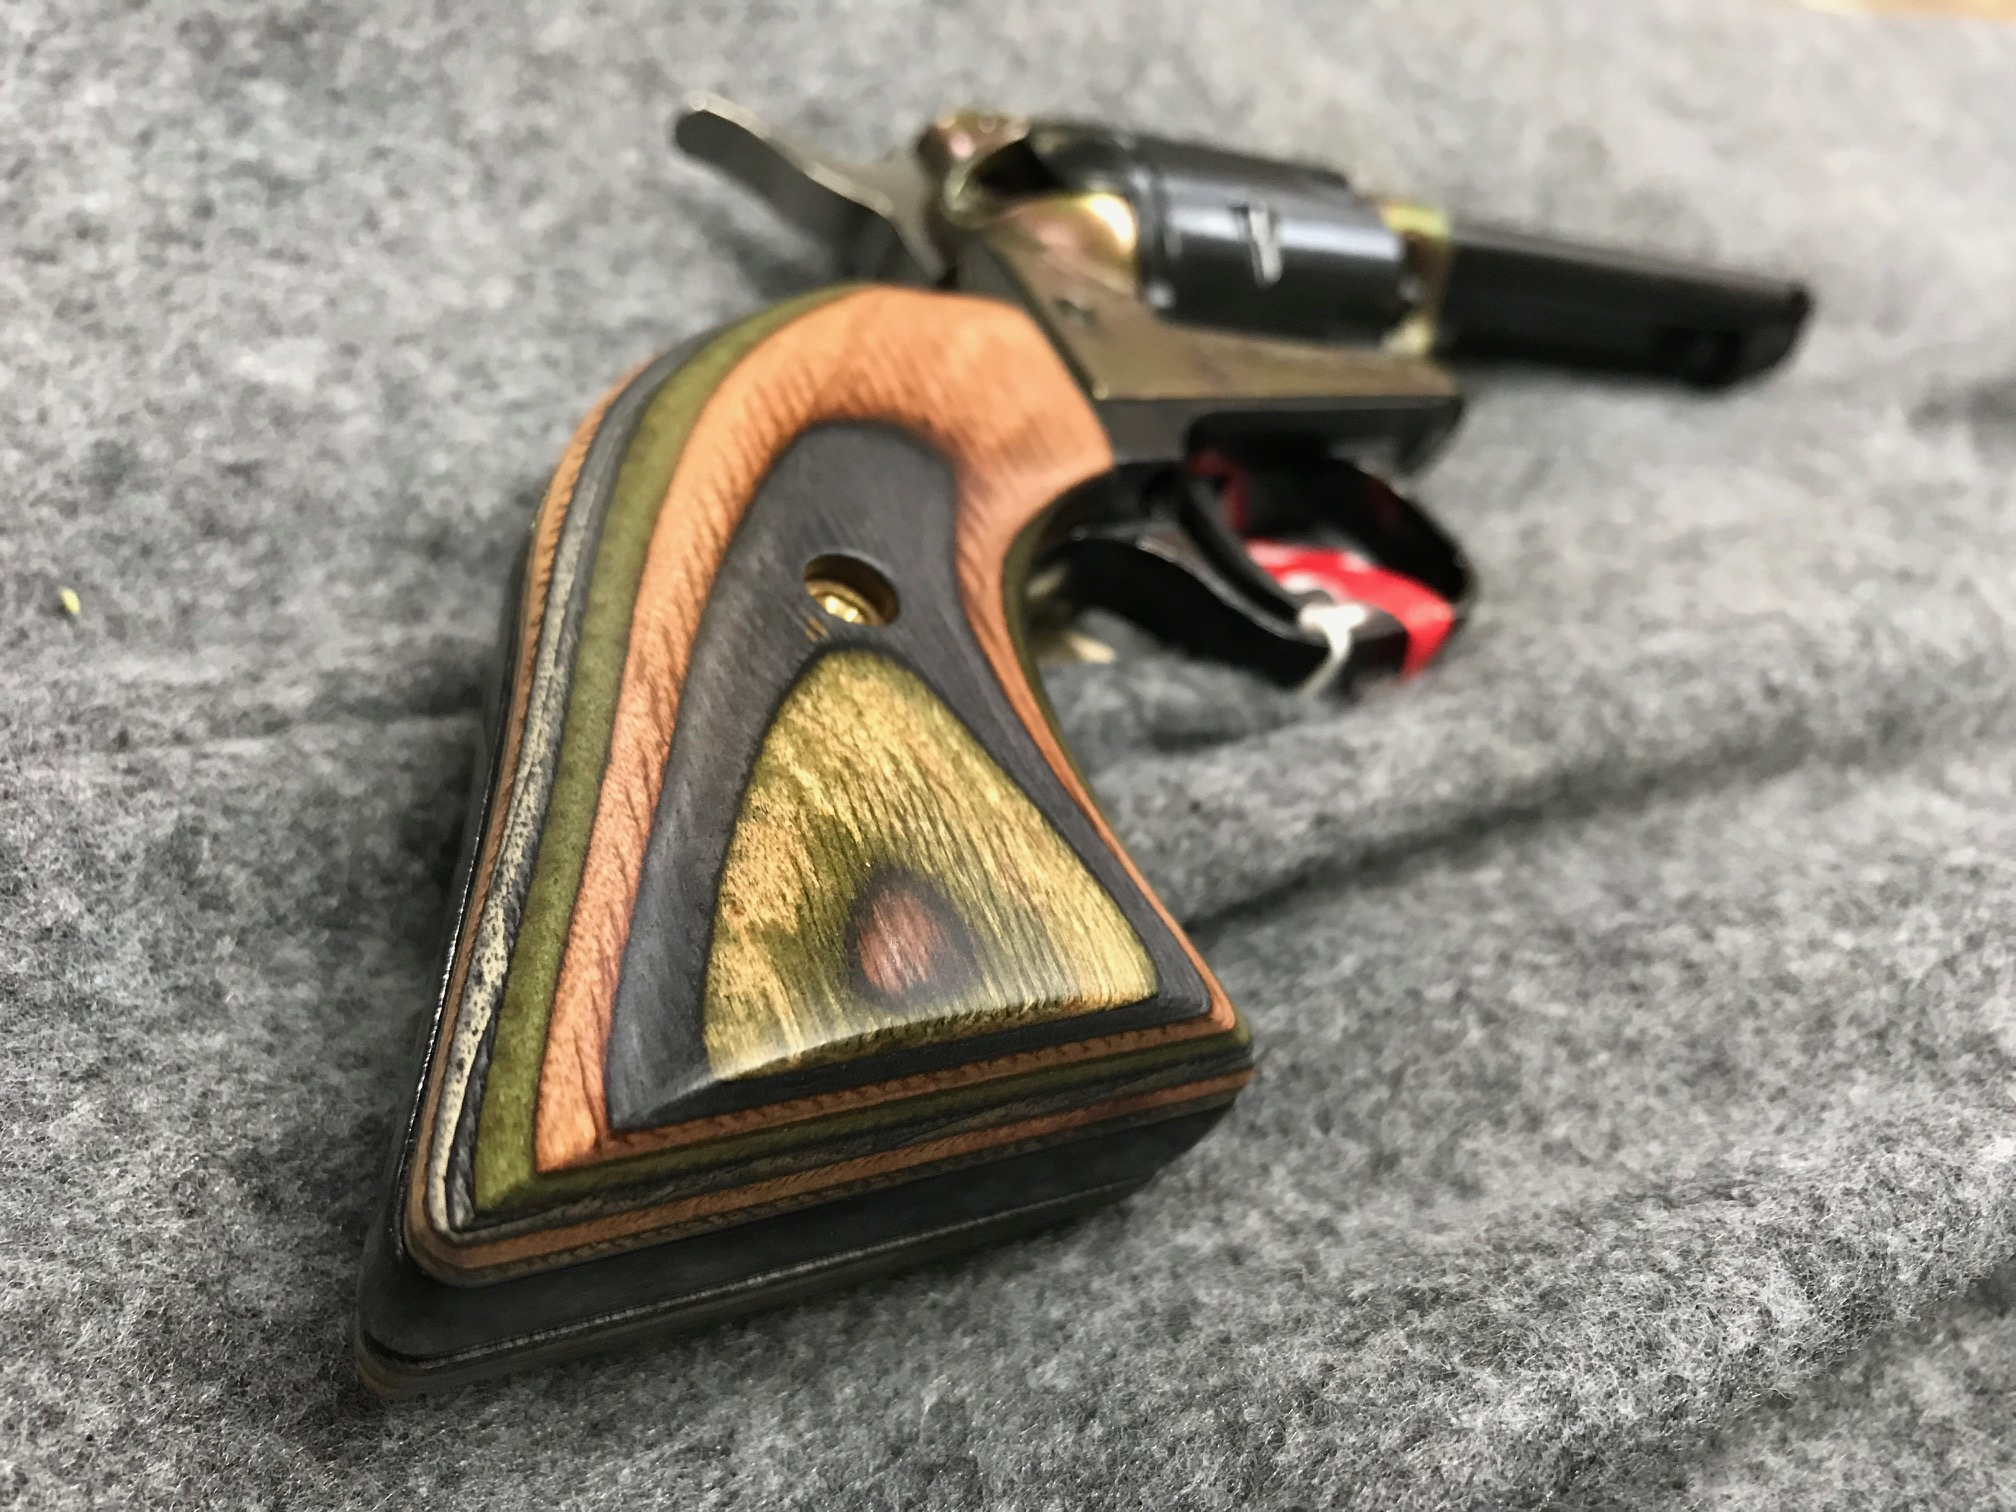 revolver-with-laminated-grip.jpg